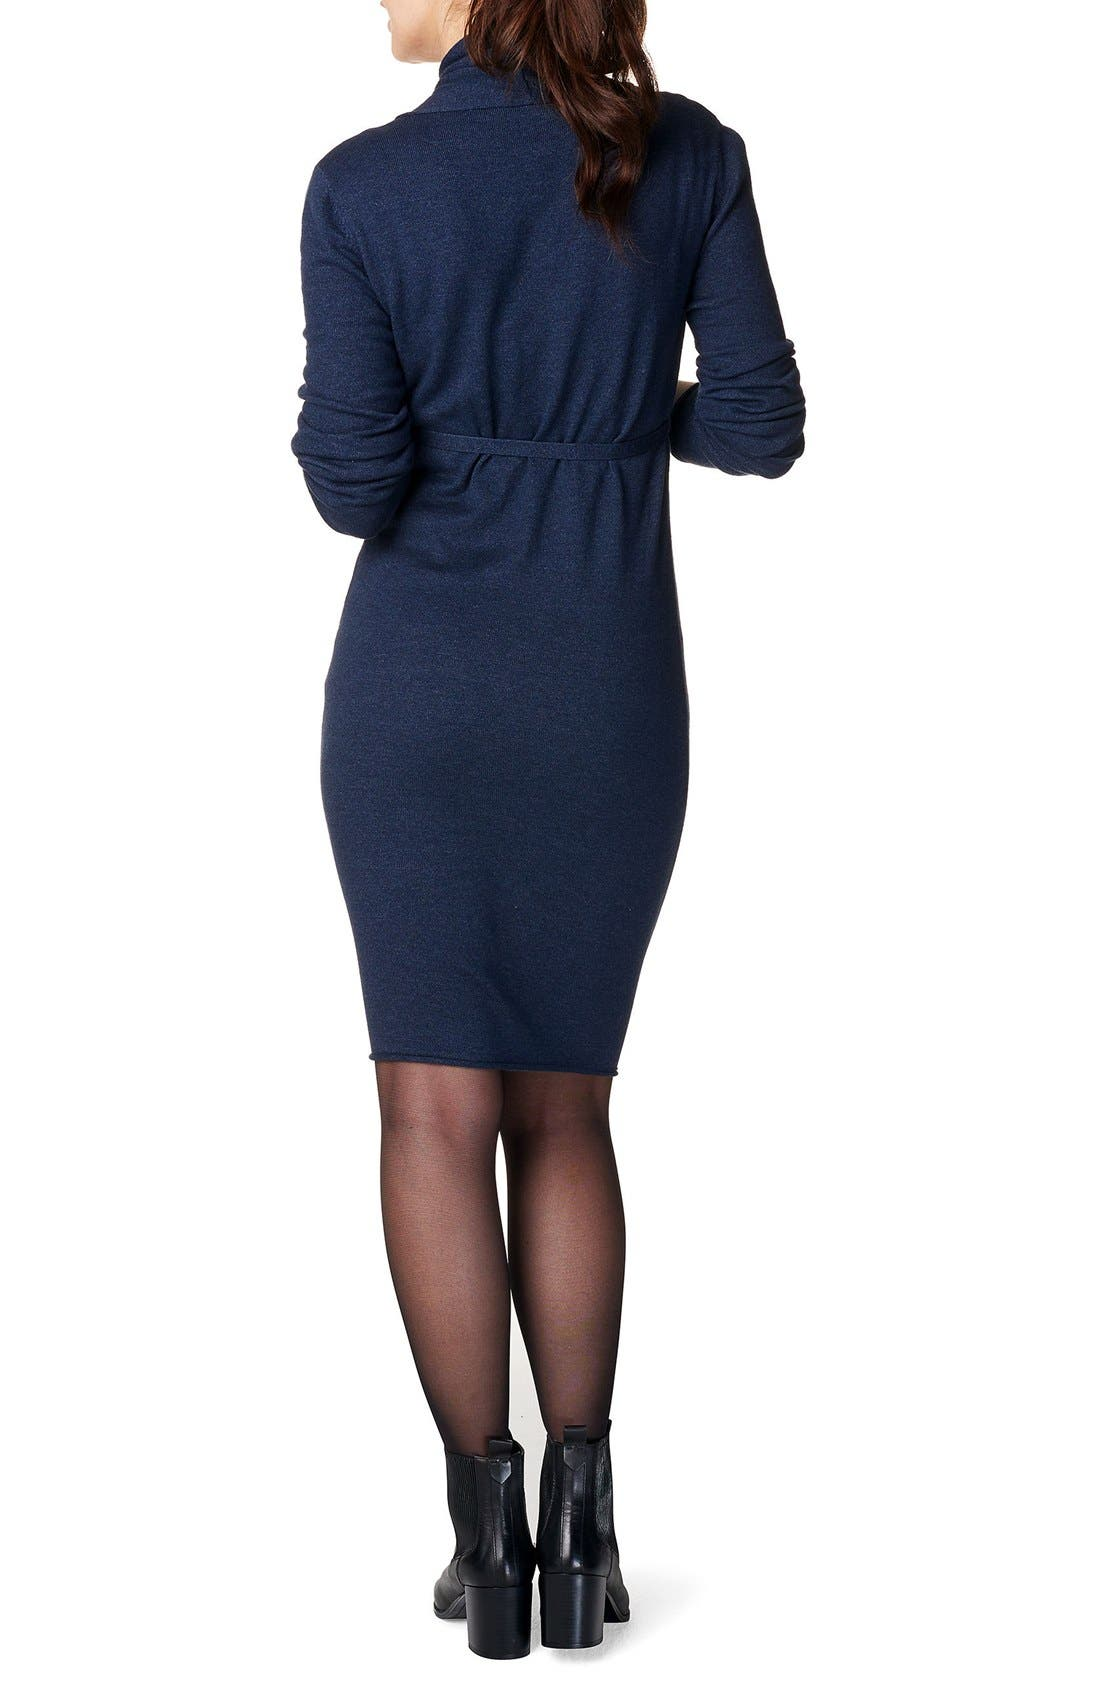 Zara Knit Maternity Sweater Dress,                             Alternate thumbnail 2, color,                             DARK BLUE